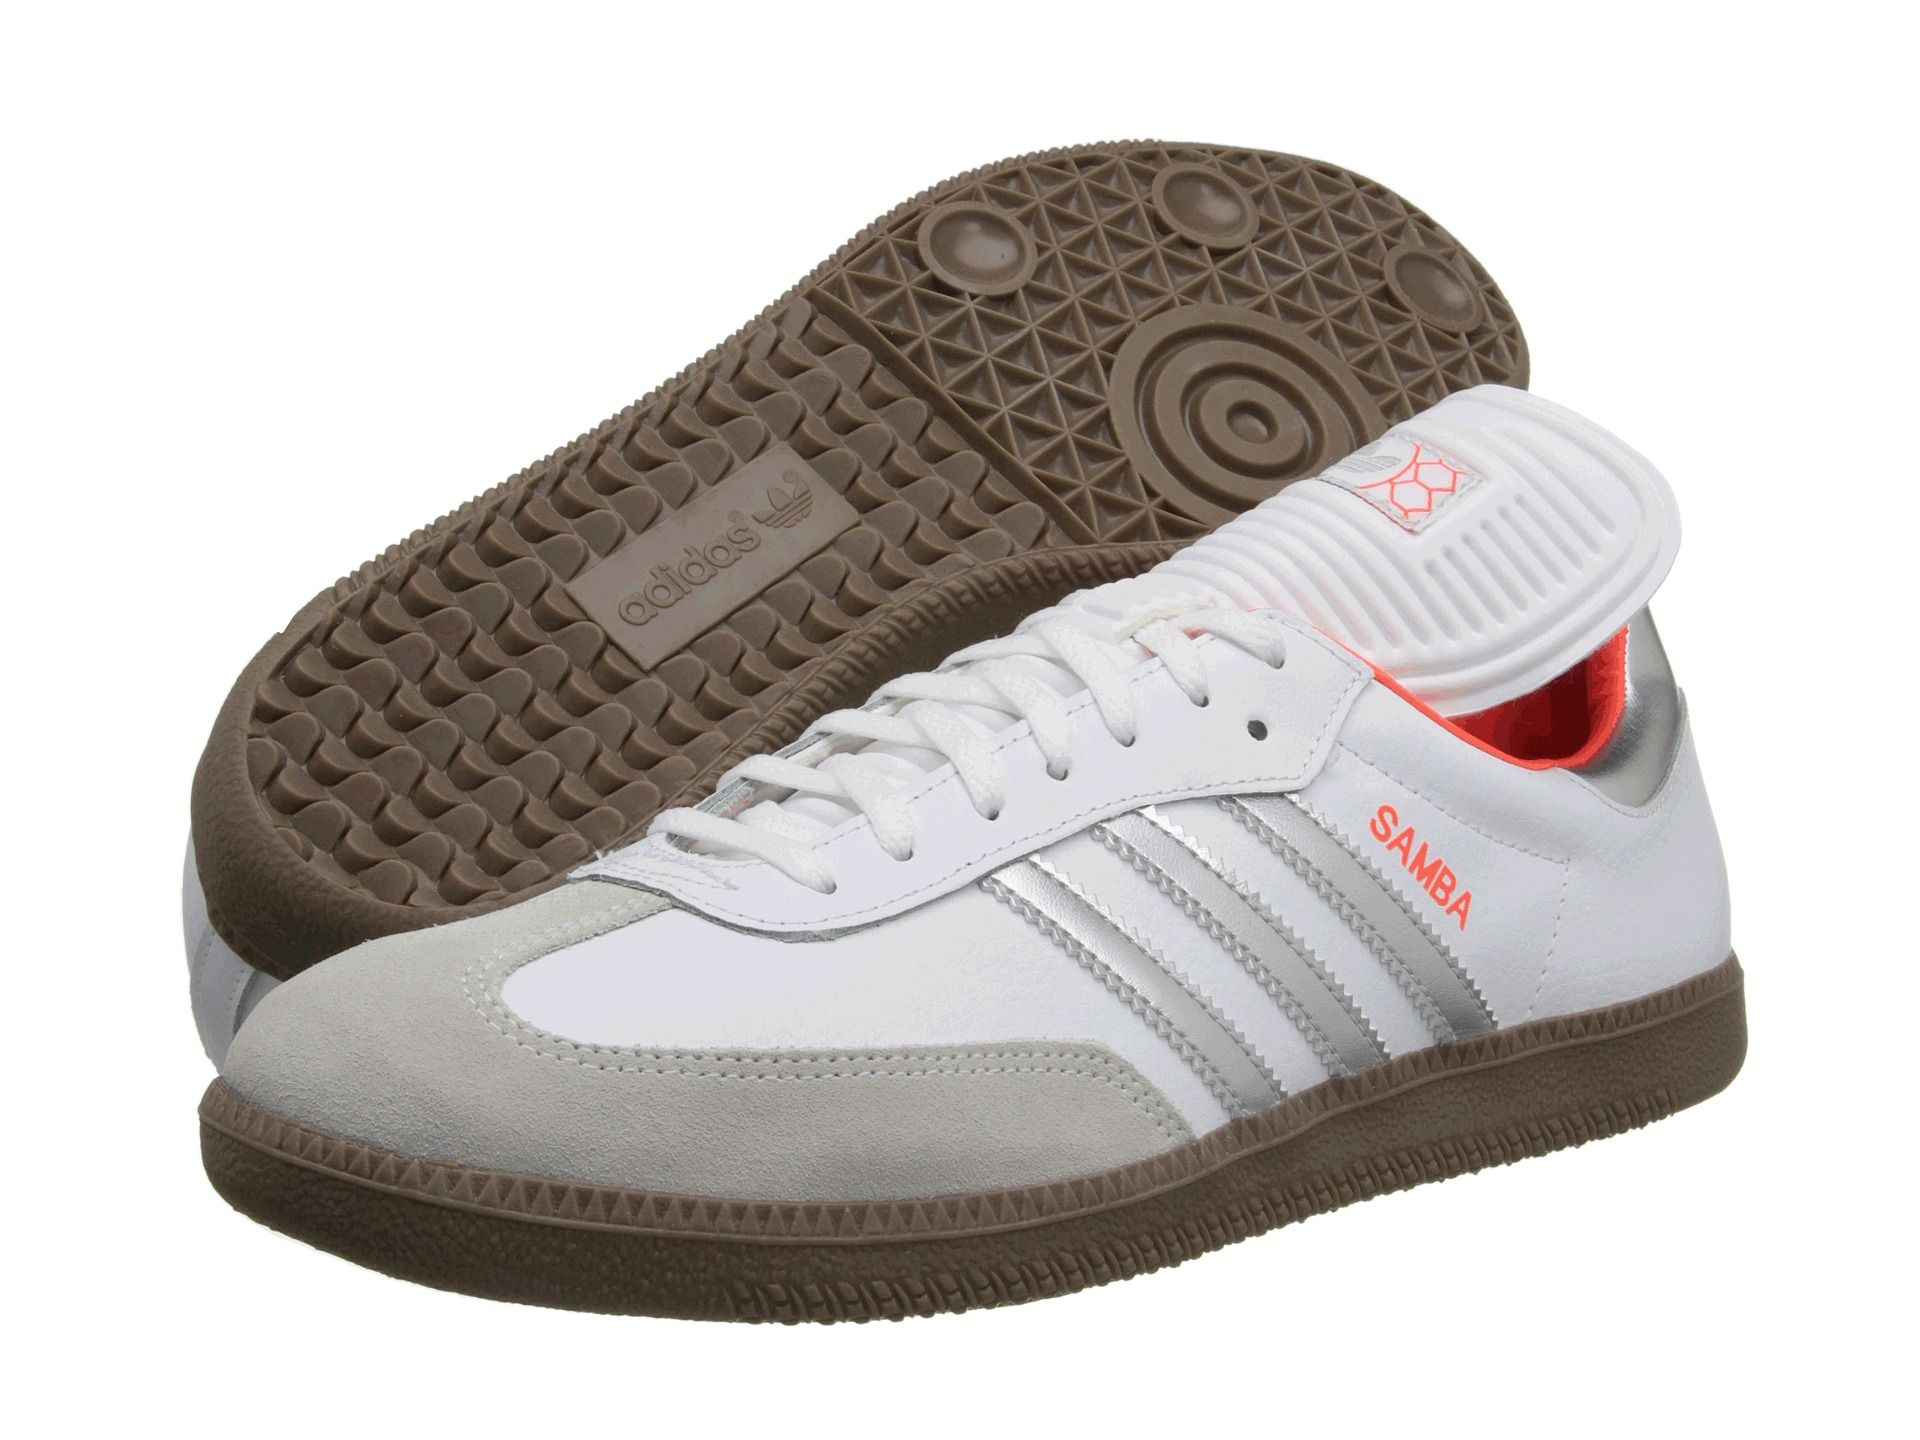 adidas Originals Samba® Leather Black/White